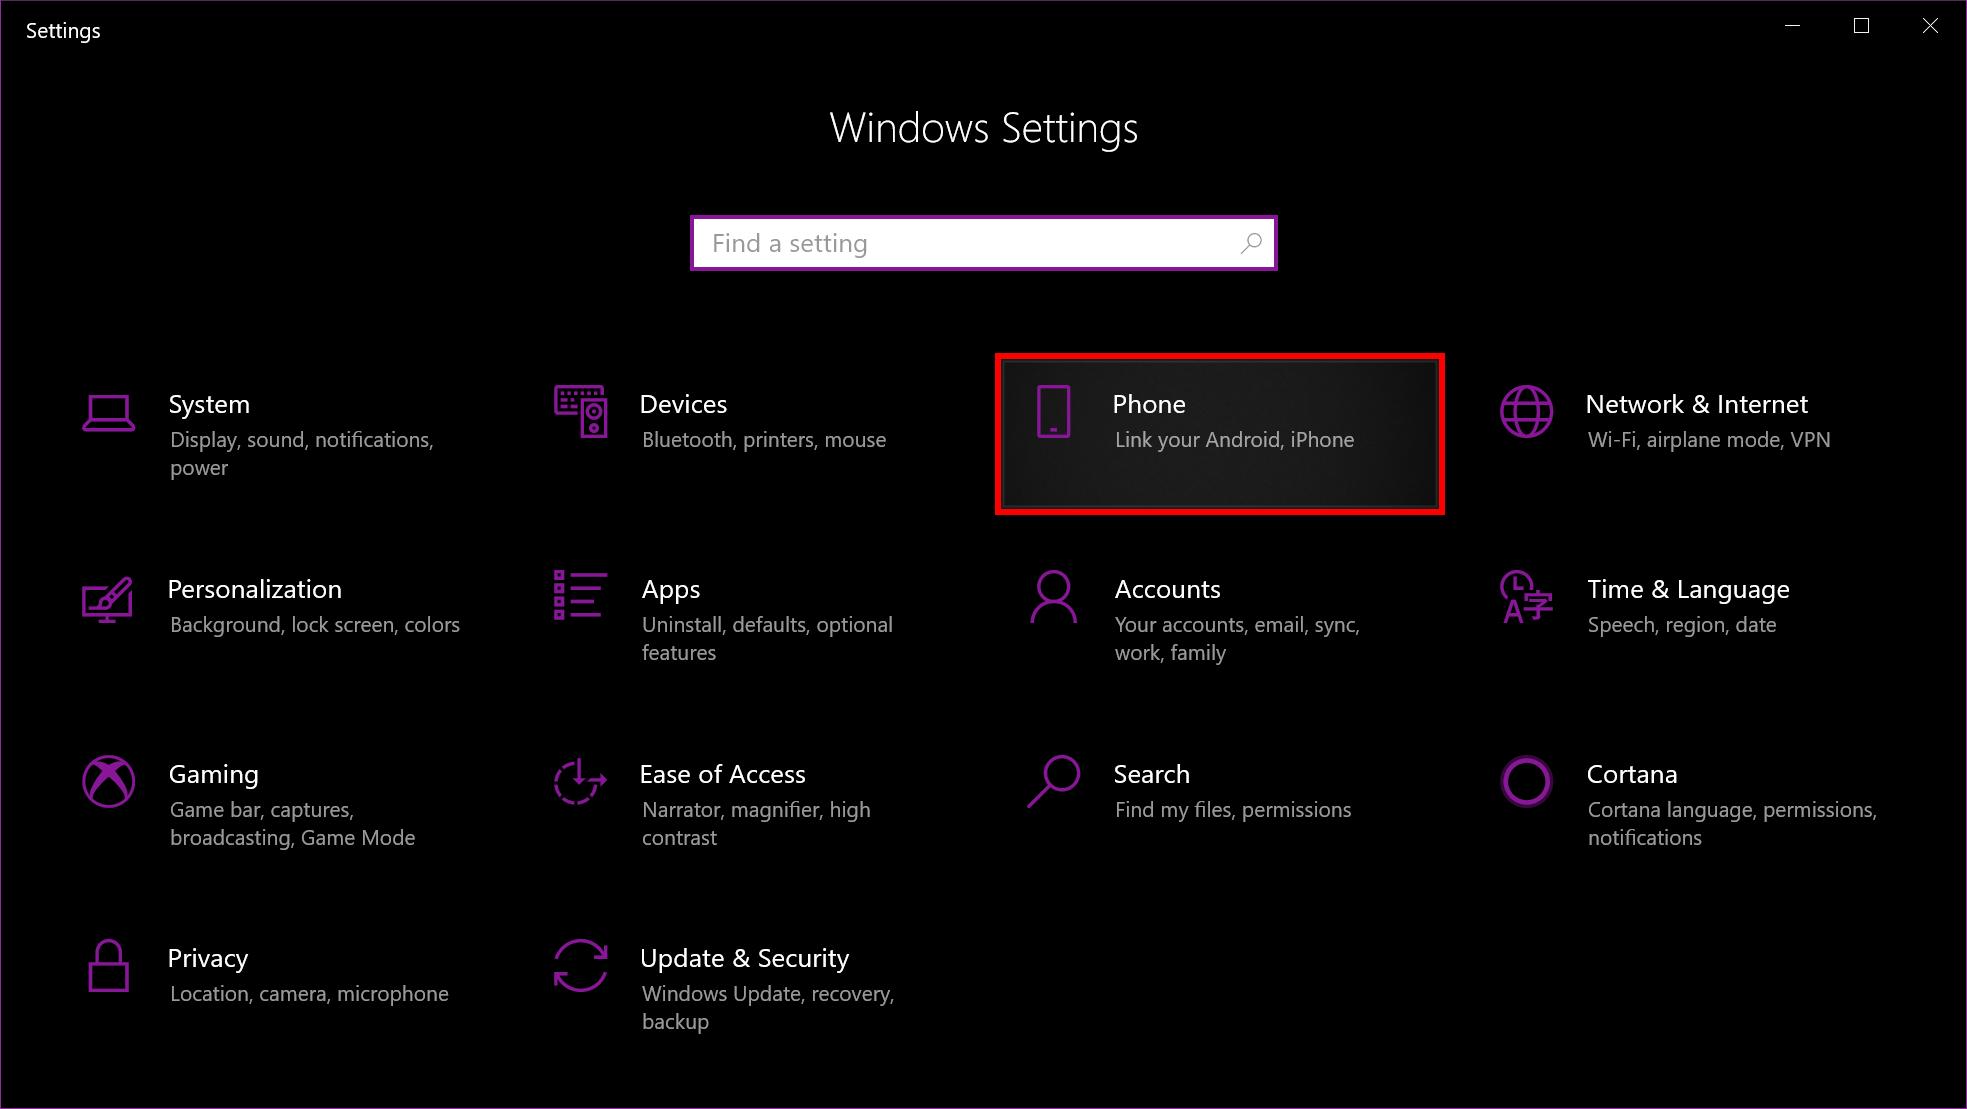 Windows 10 Phone Settings